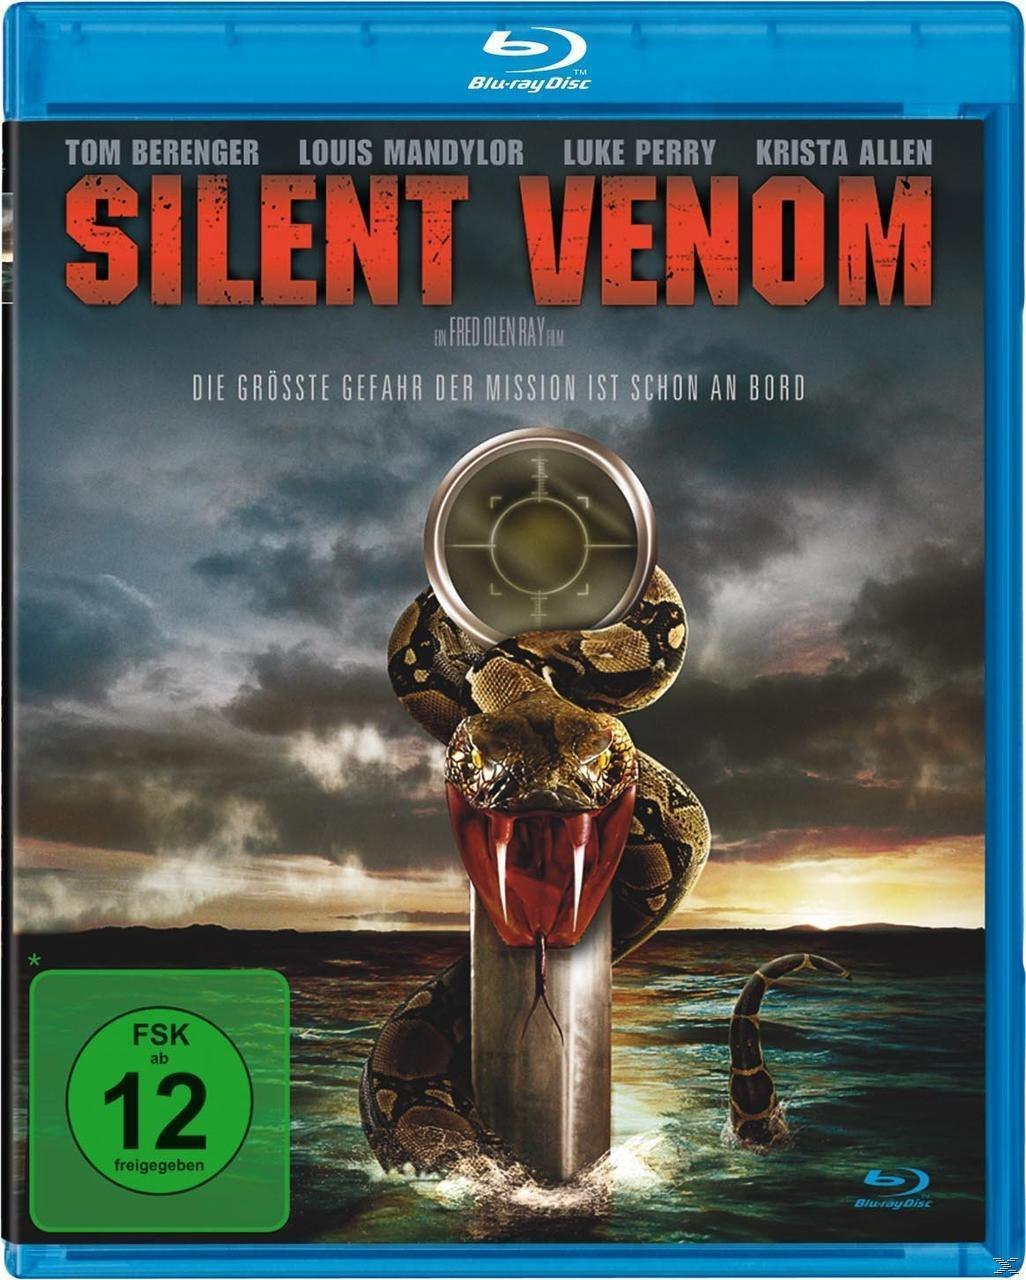 Silent Venom - Snakes on a Submarine (BLU-RAY) für 9,99 Euro